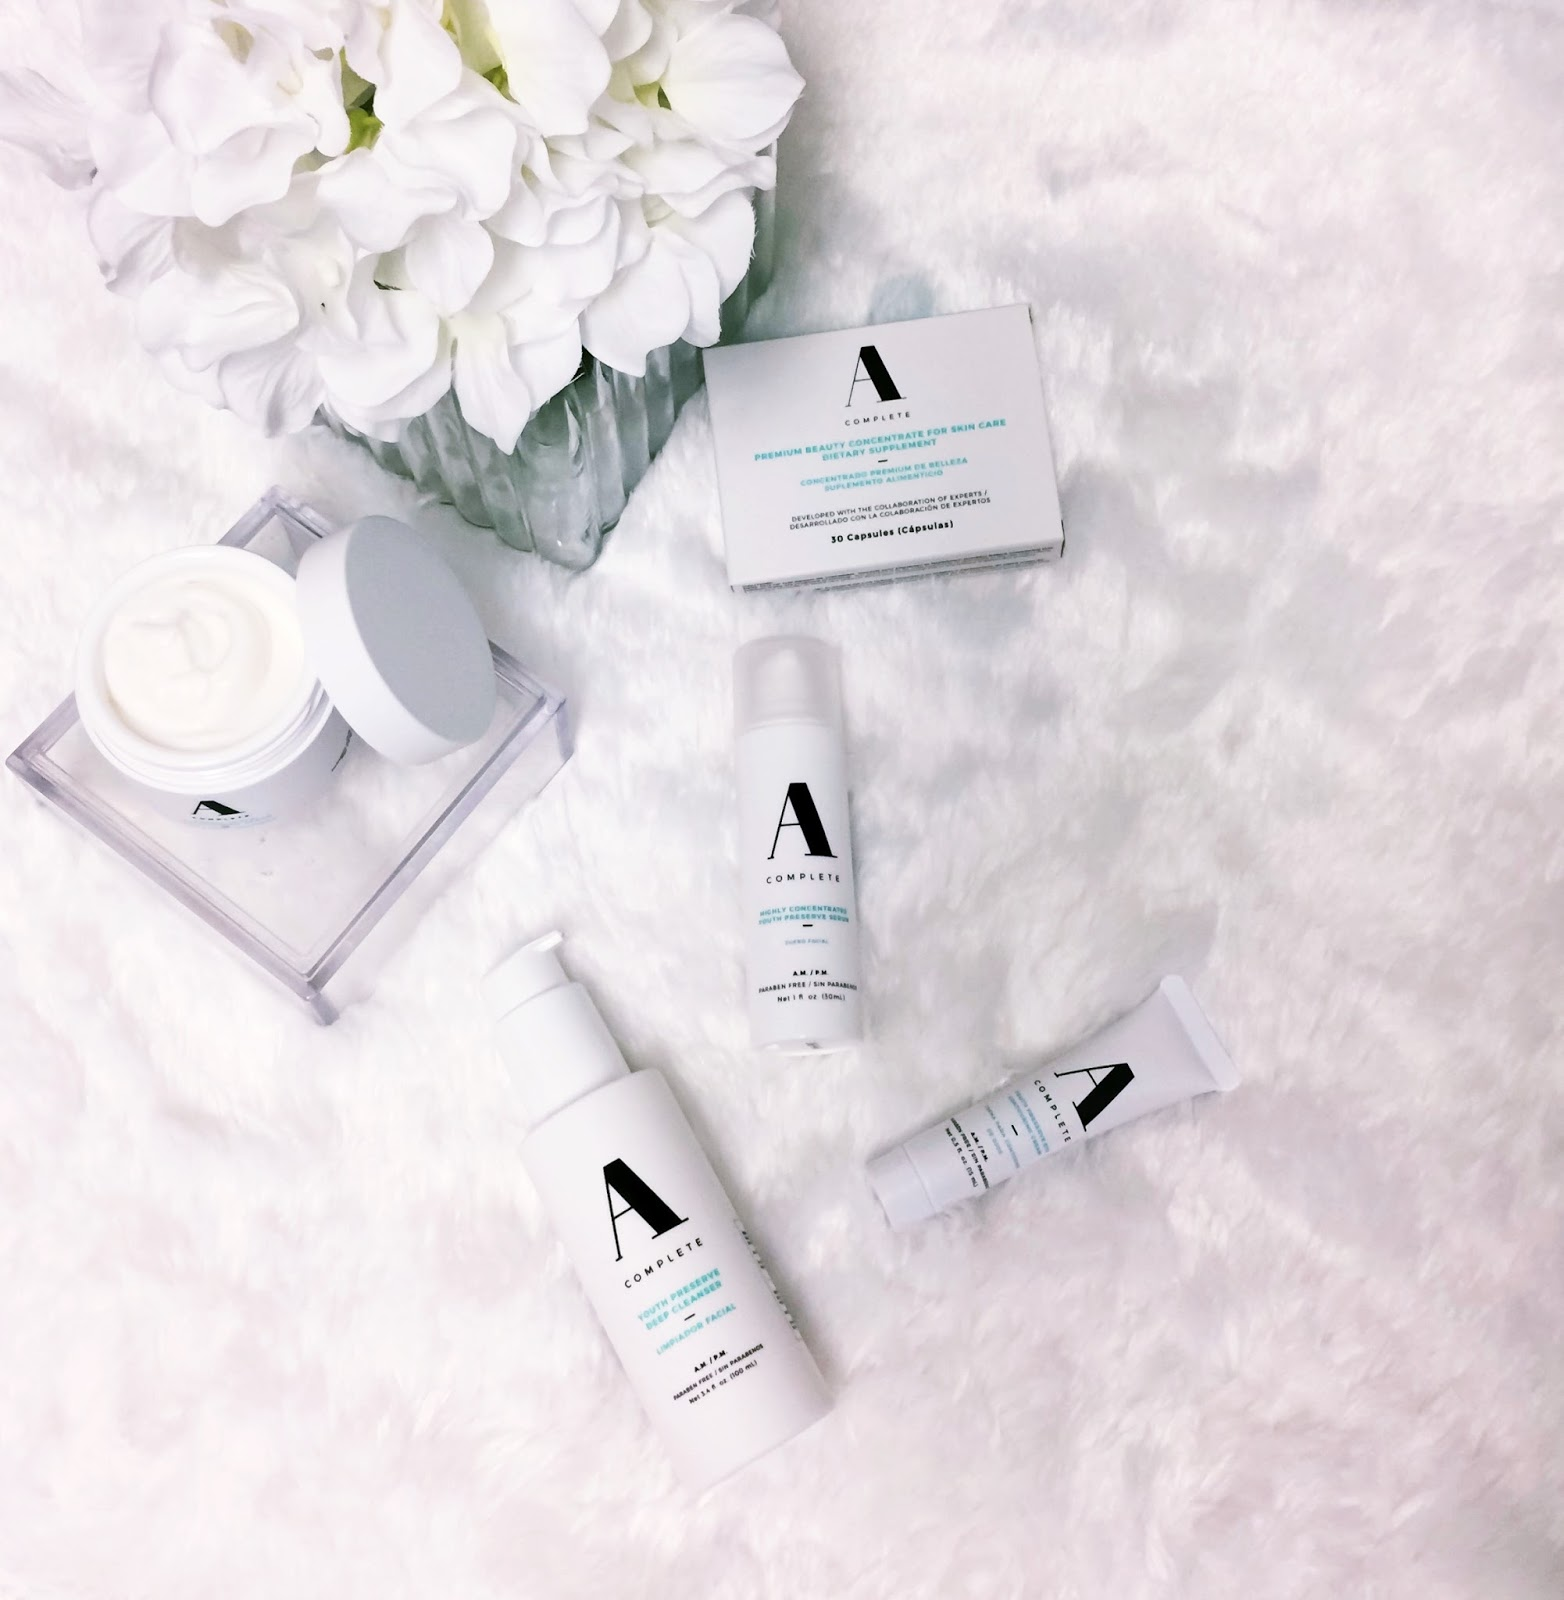 A complete beauty, skincare, deep cleanser, beauty tips, eye cream, skin care supplement, beauty pills, moisturizing cream, latina skicare line